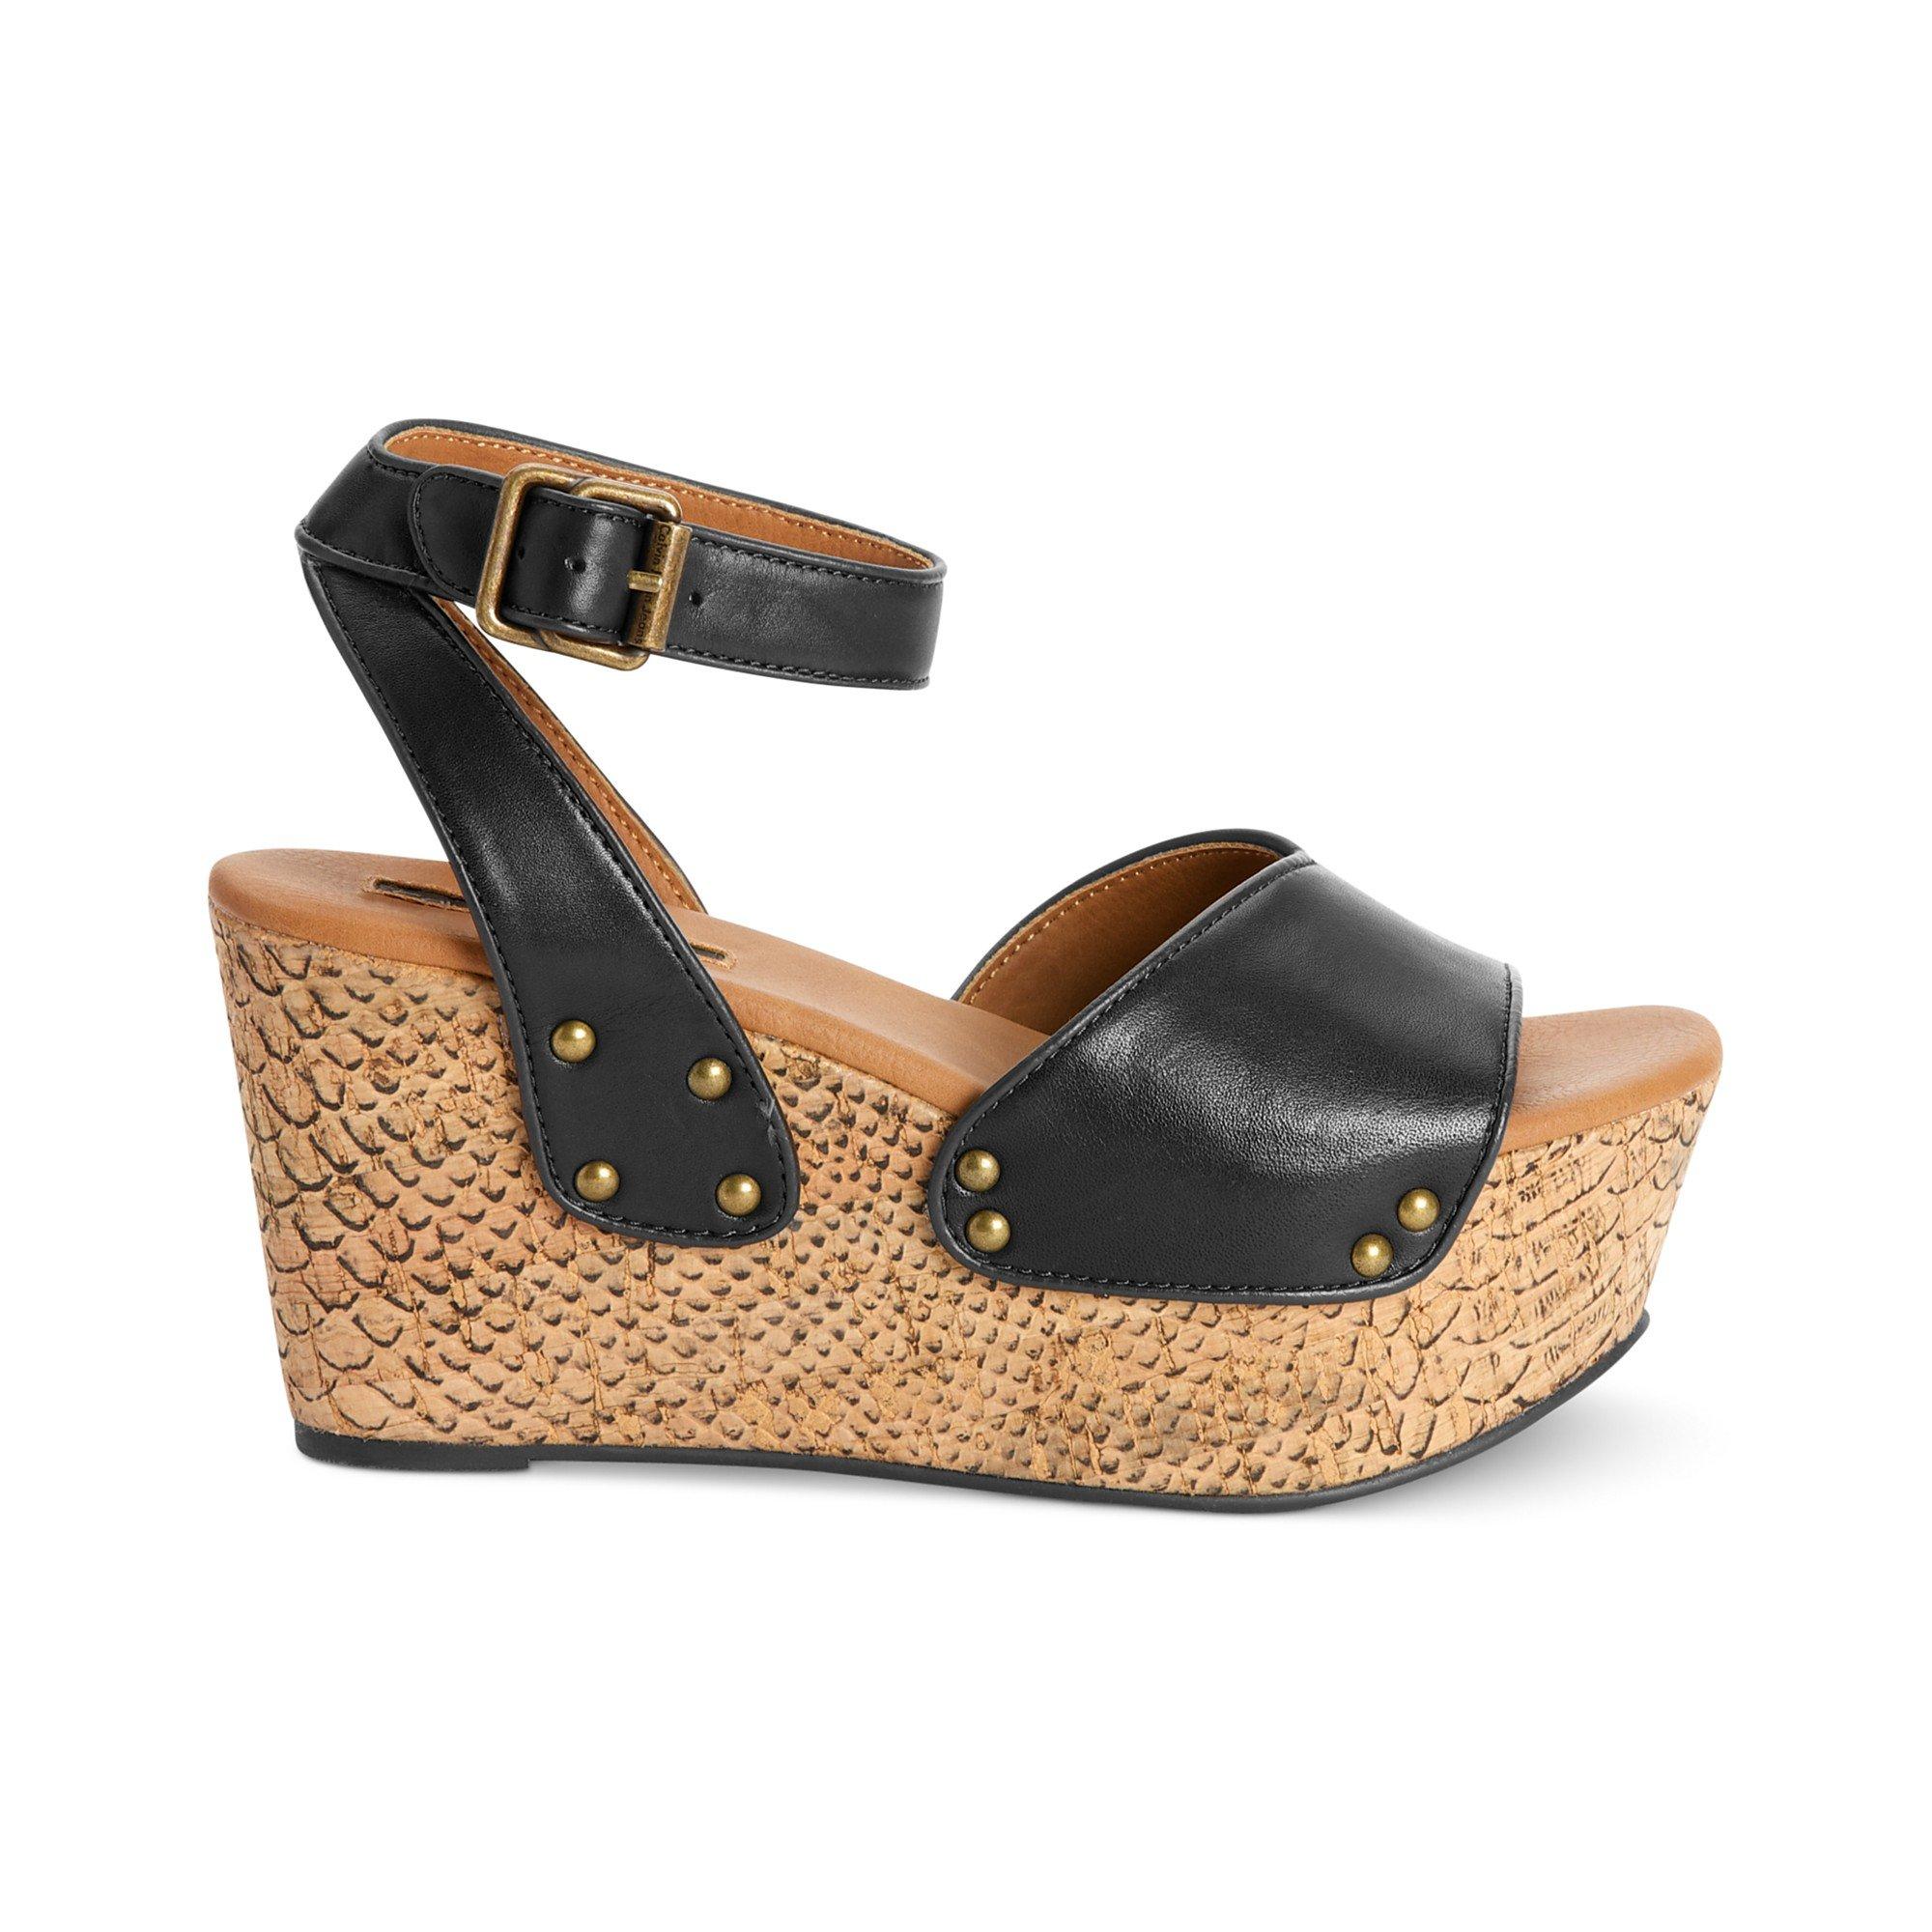 Calvin Klein Ck Jeans Womens Shoes Calla Platform Wedge